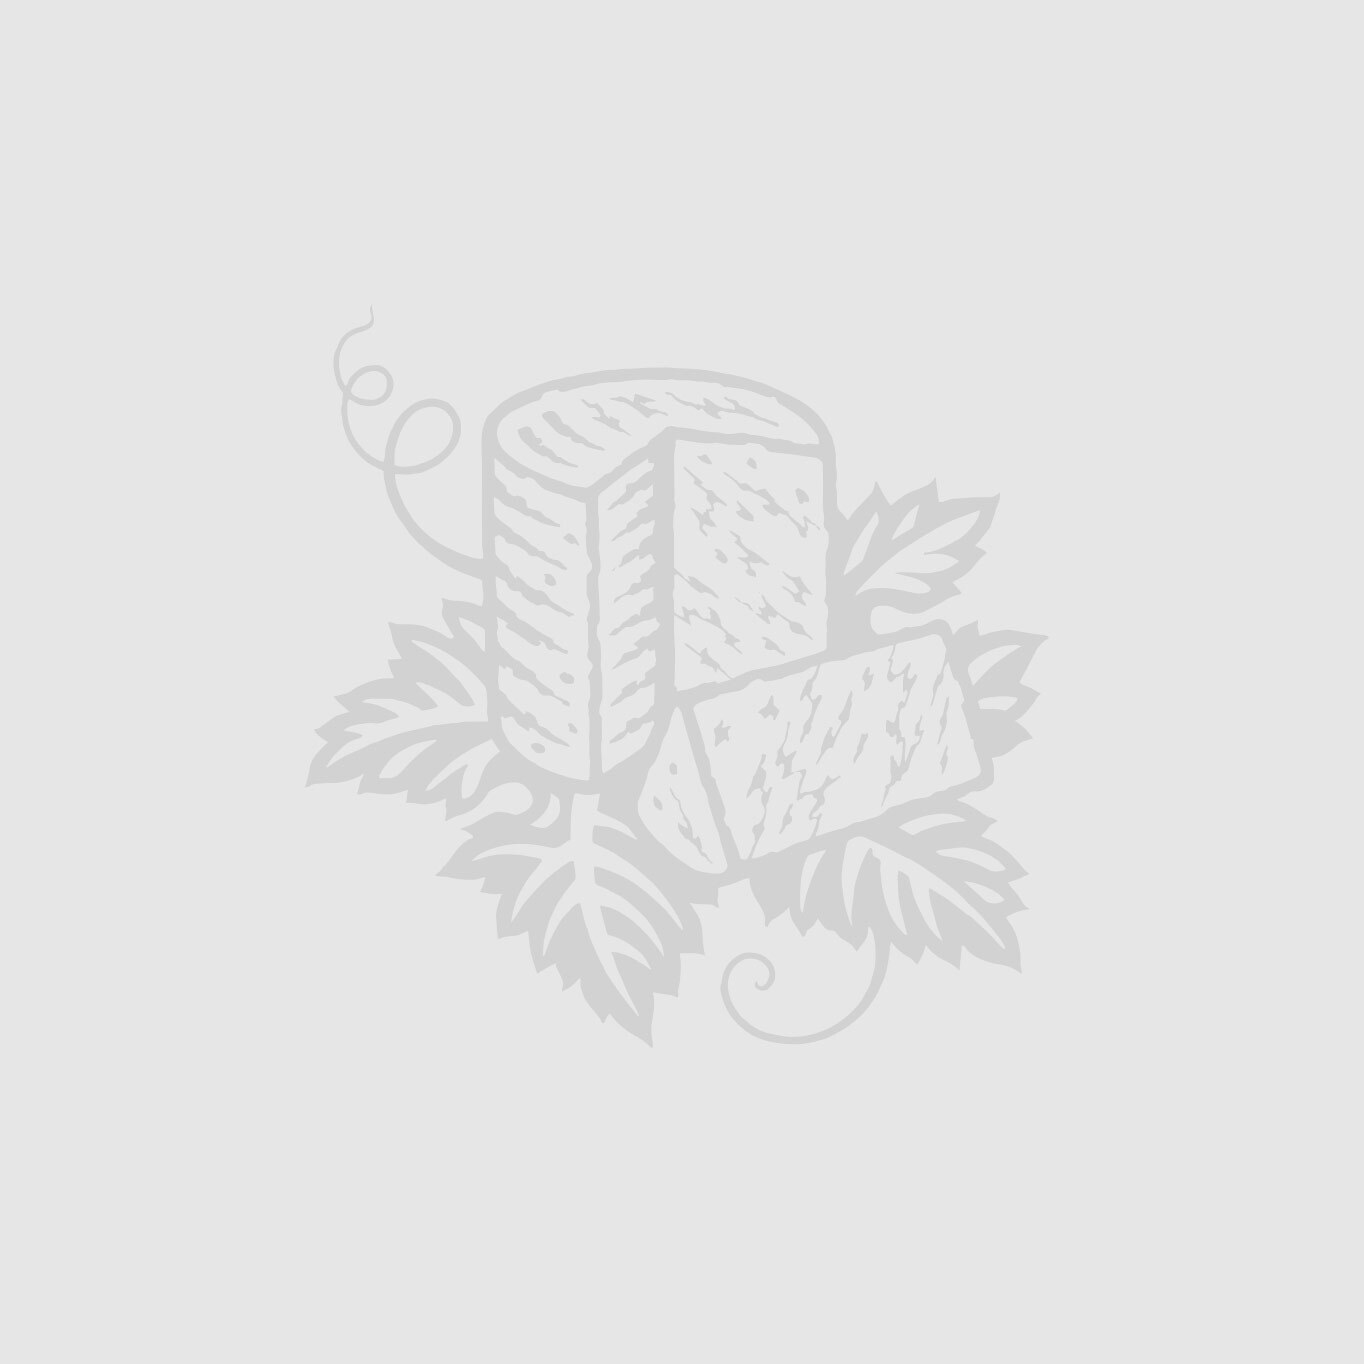 Torres 'La Oscuridad' Parellada White Wine Vinegar 250ml